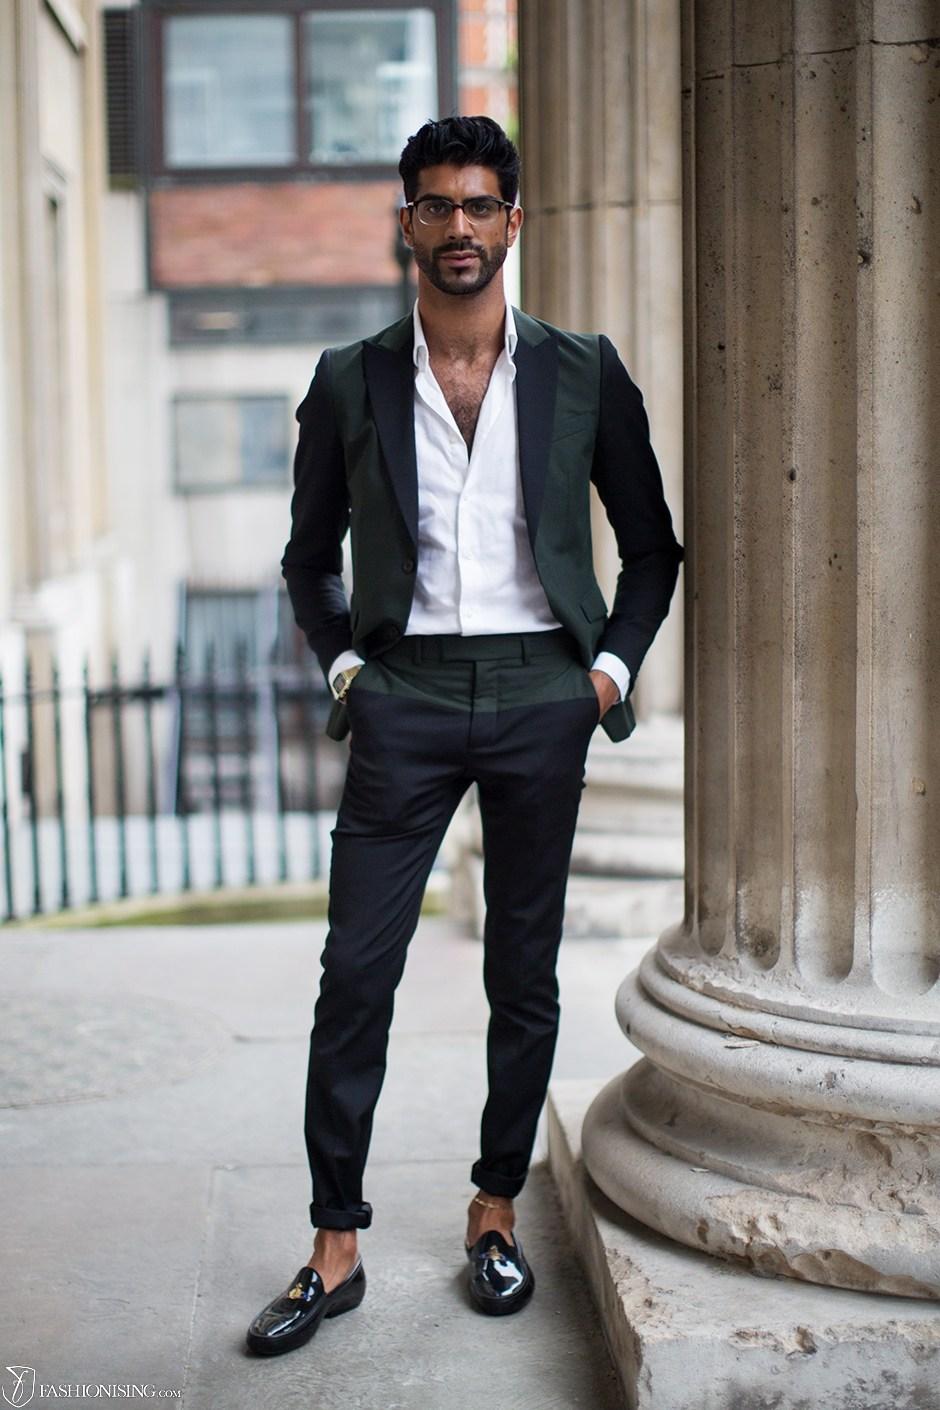 Loafers Men Black Suits